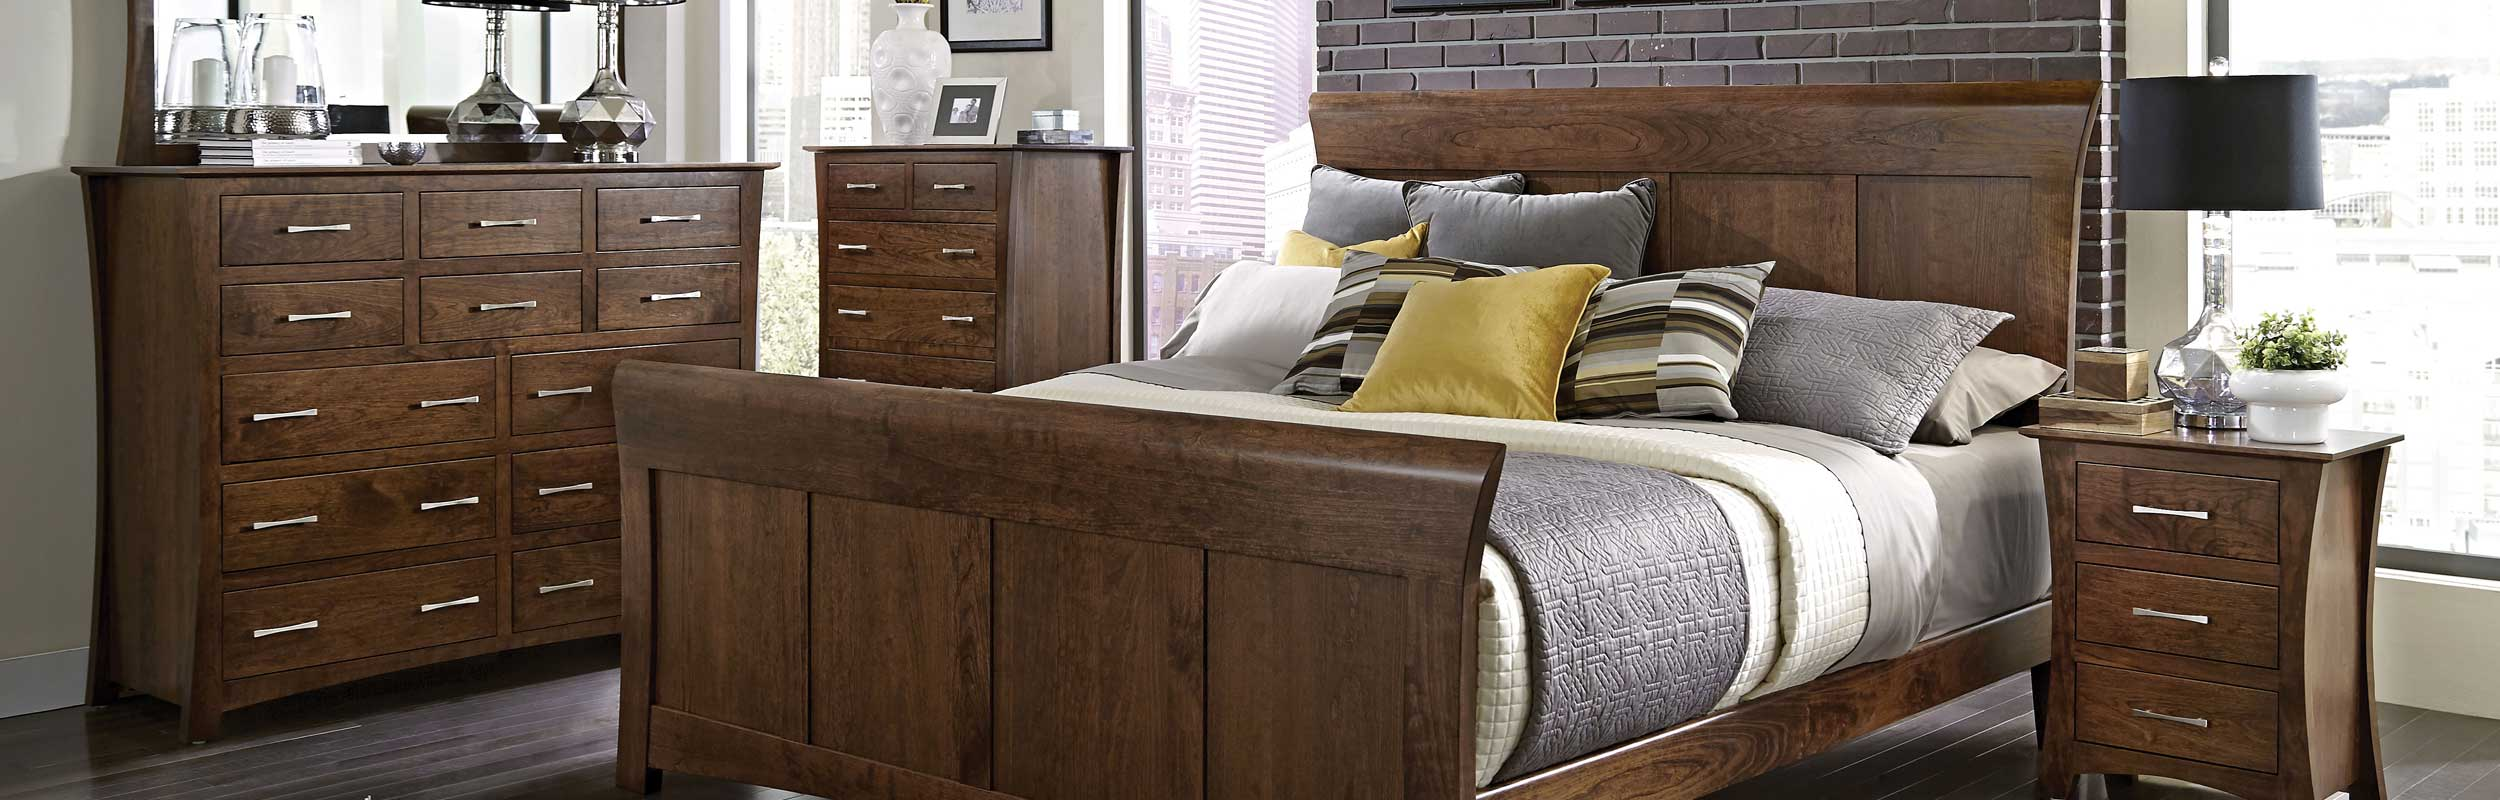 furniture store northern va alexandria arlington washington dc. Black Bedroom Furniture Sets. Home Design Ideas